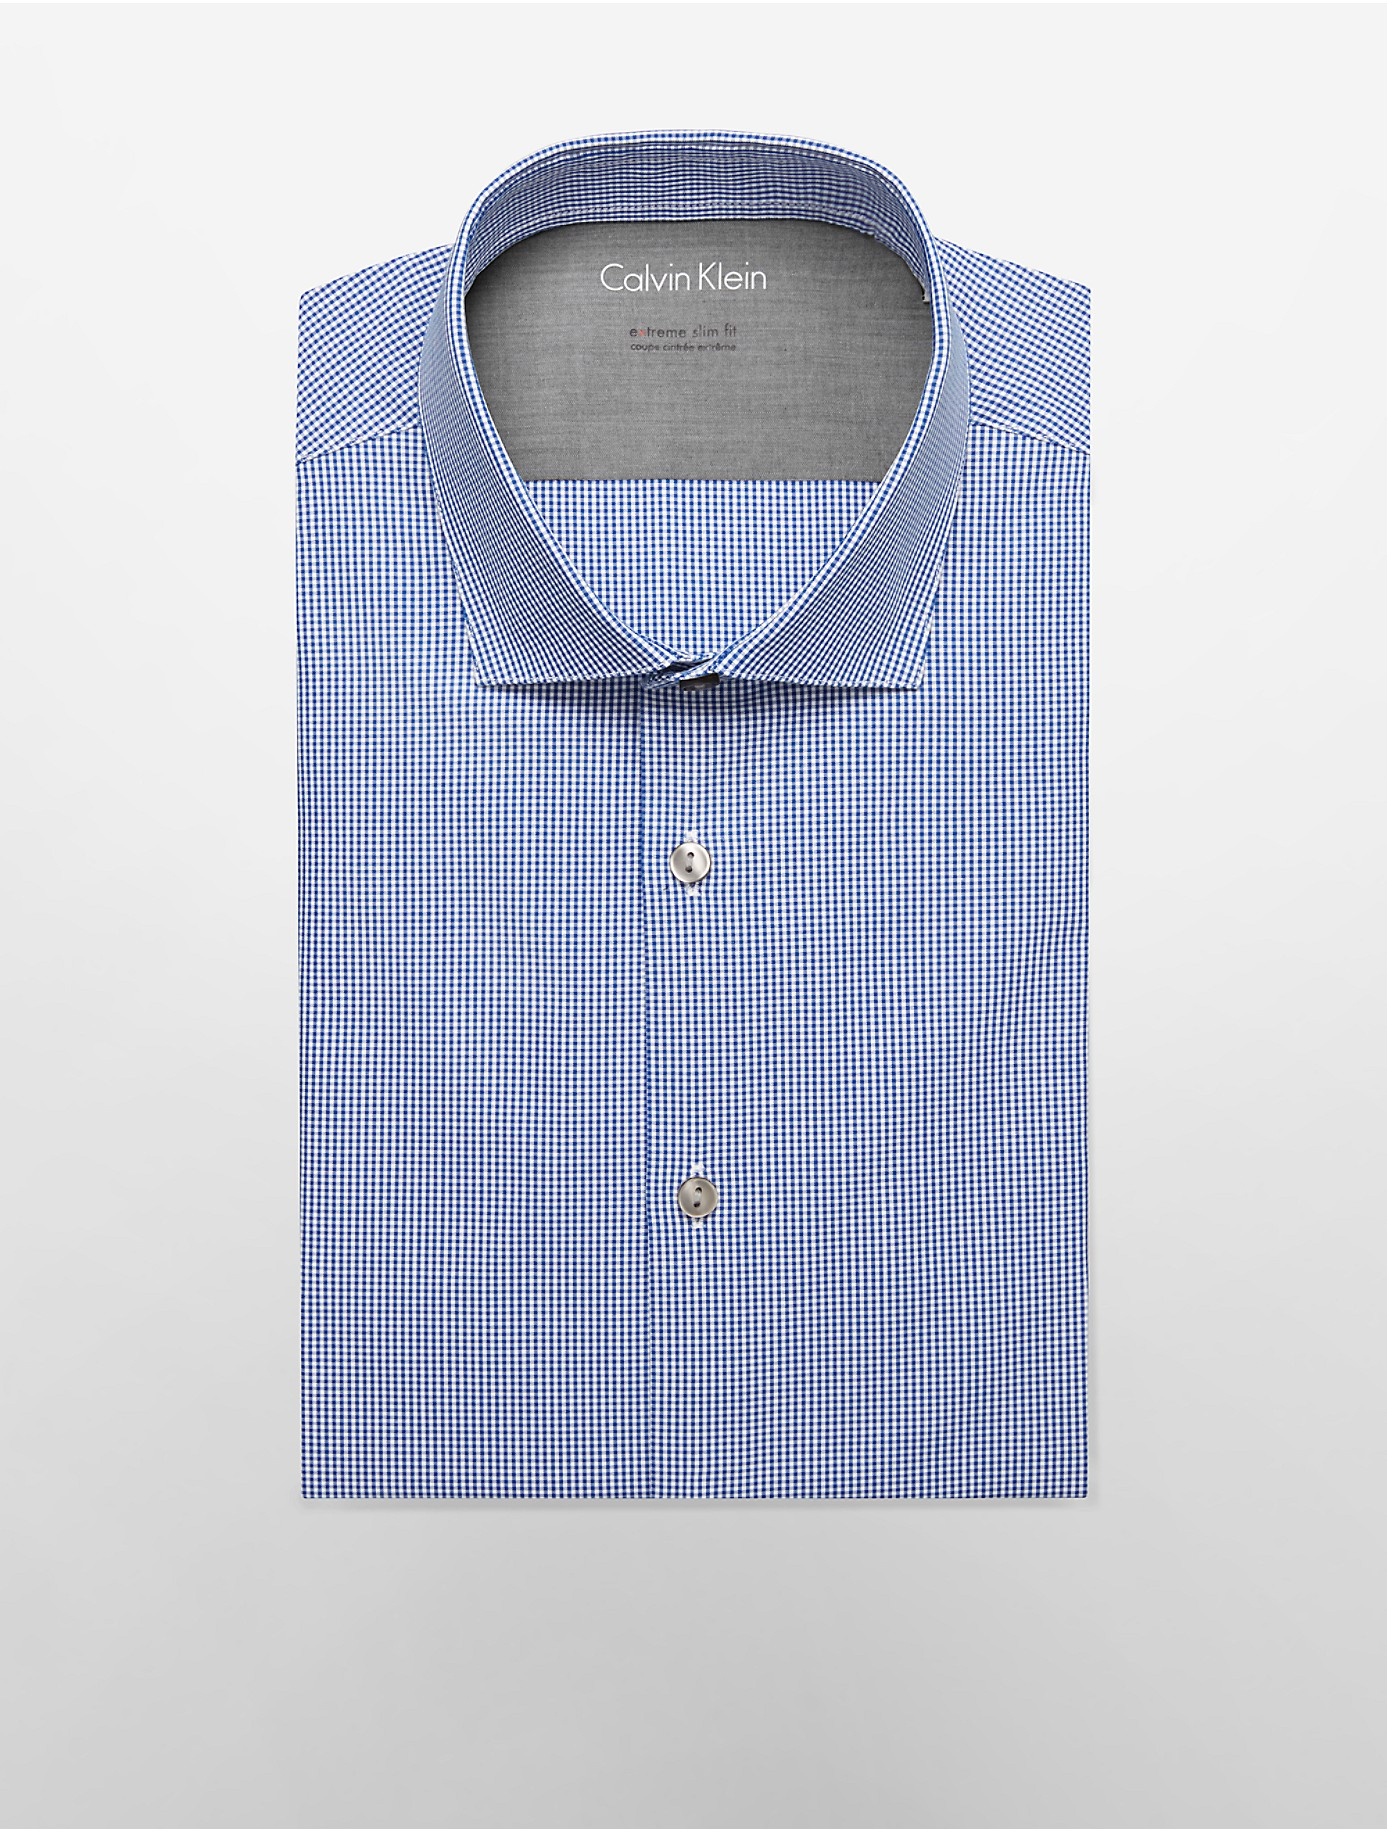 Lyst calvin klein white label x fit ultra slim fit navy for Calvin klein x fit dress shirt